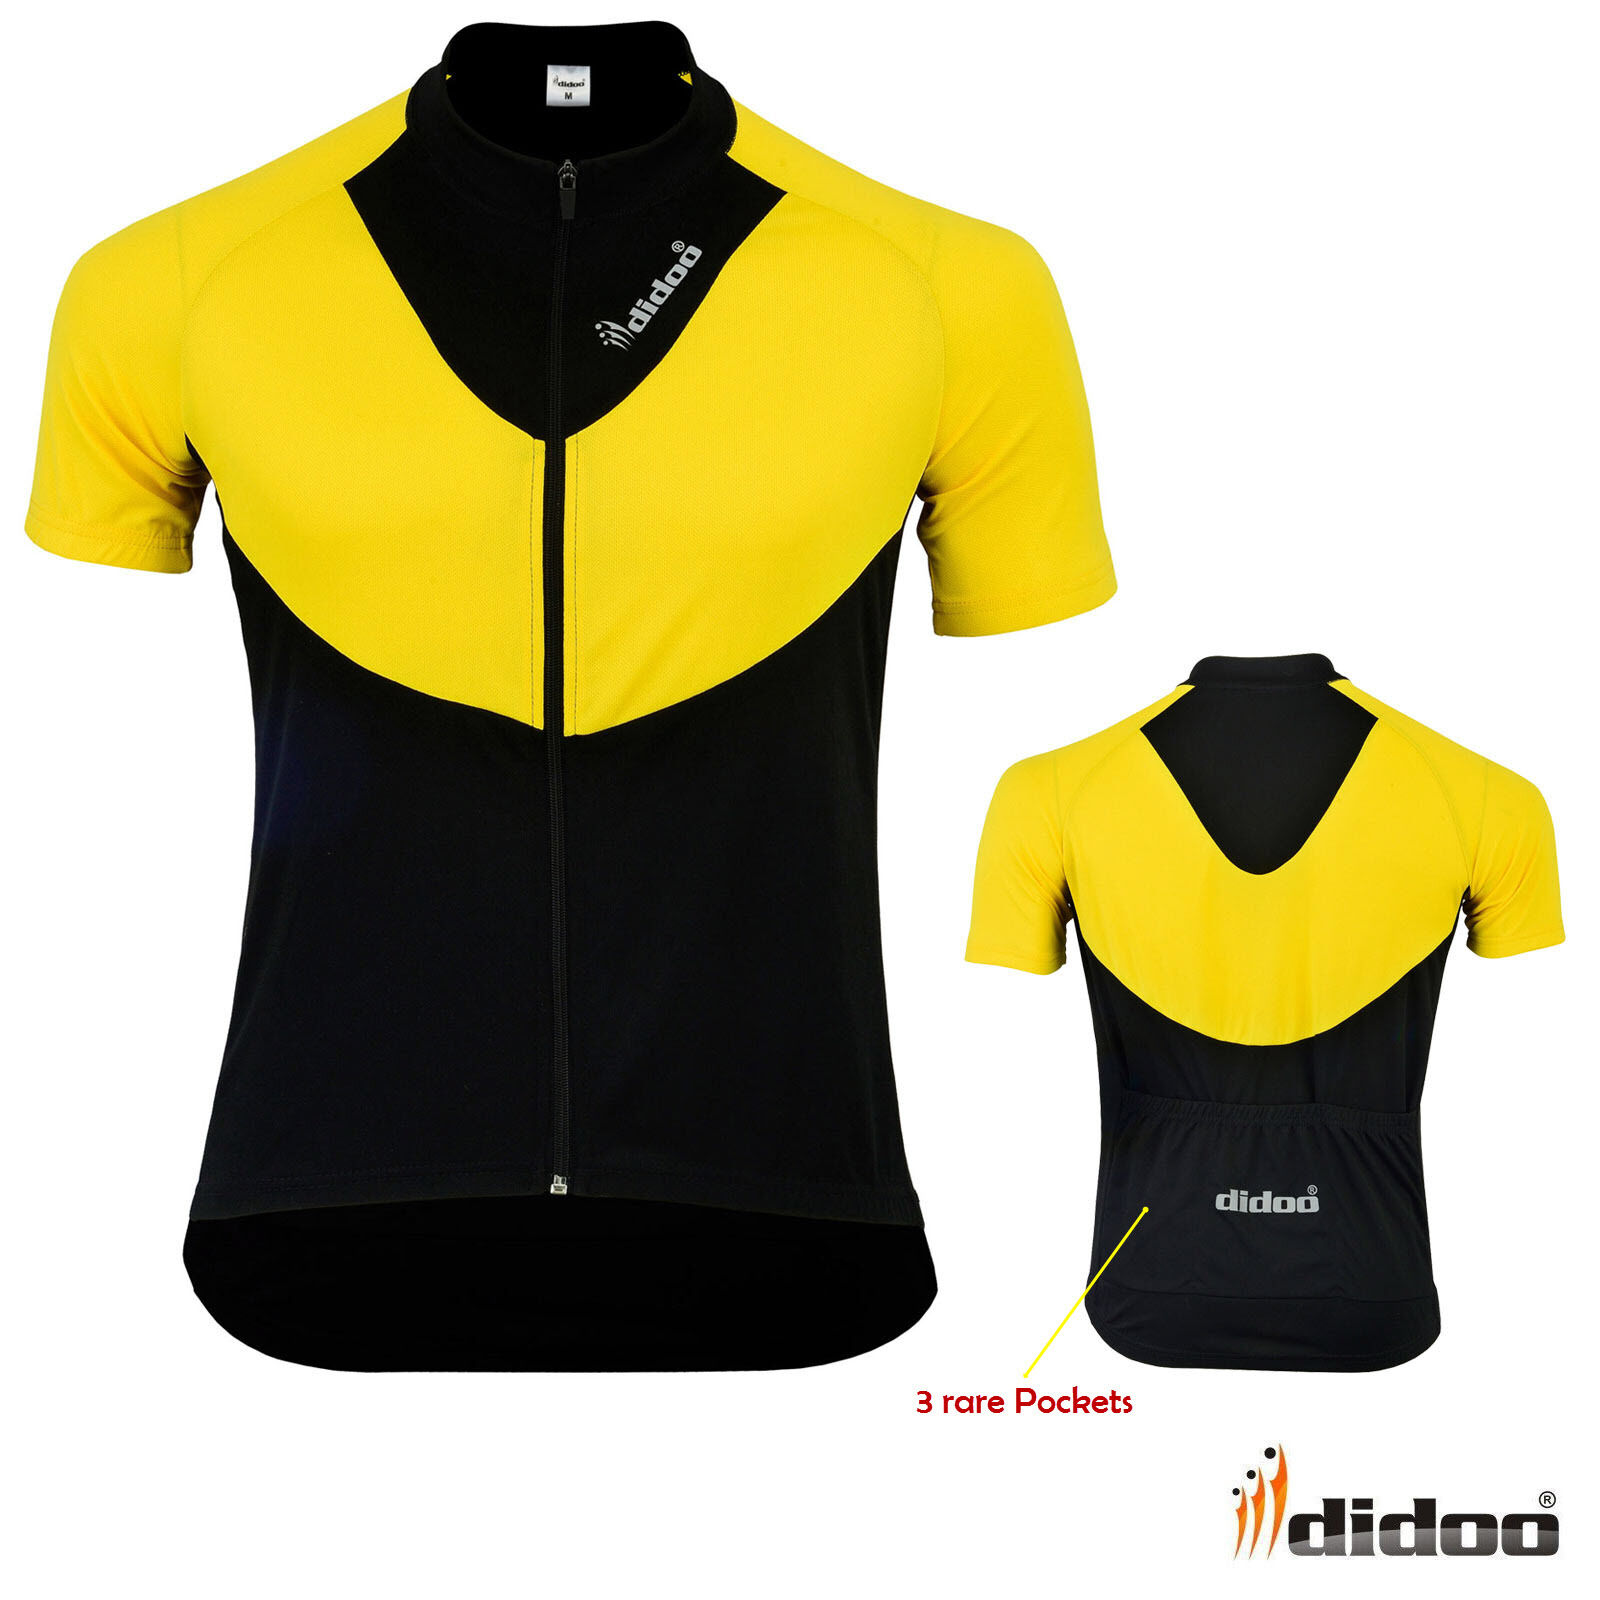 Details about Men s Short Sleeve Cycling Jersey Bicycle Sports Wear Full  Zipper MTB Bike Tops 551138e7c